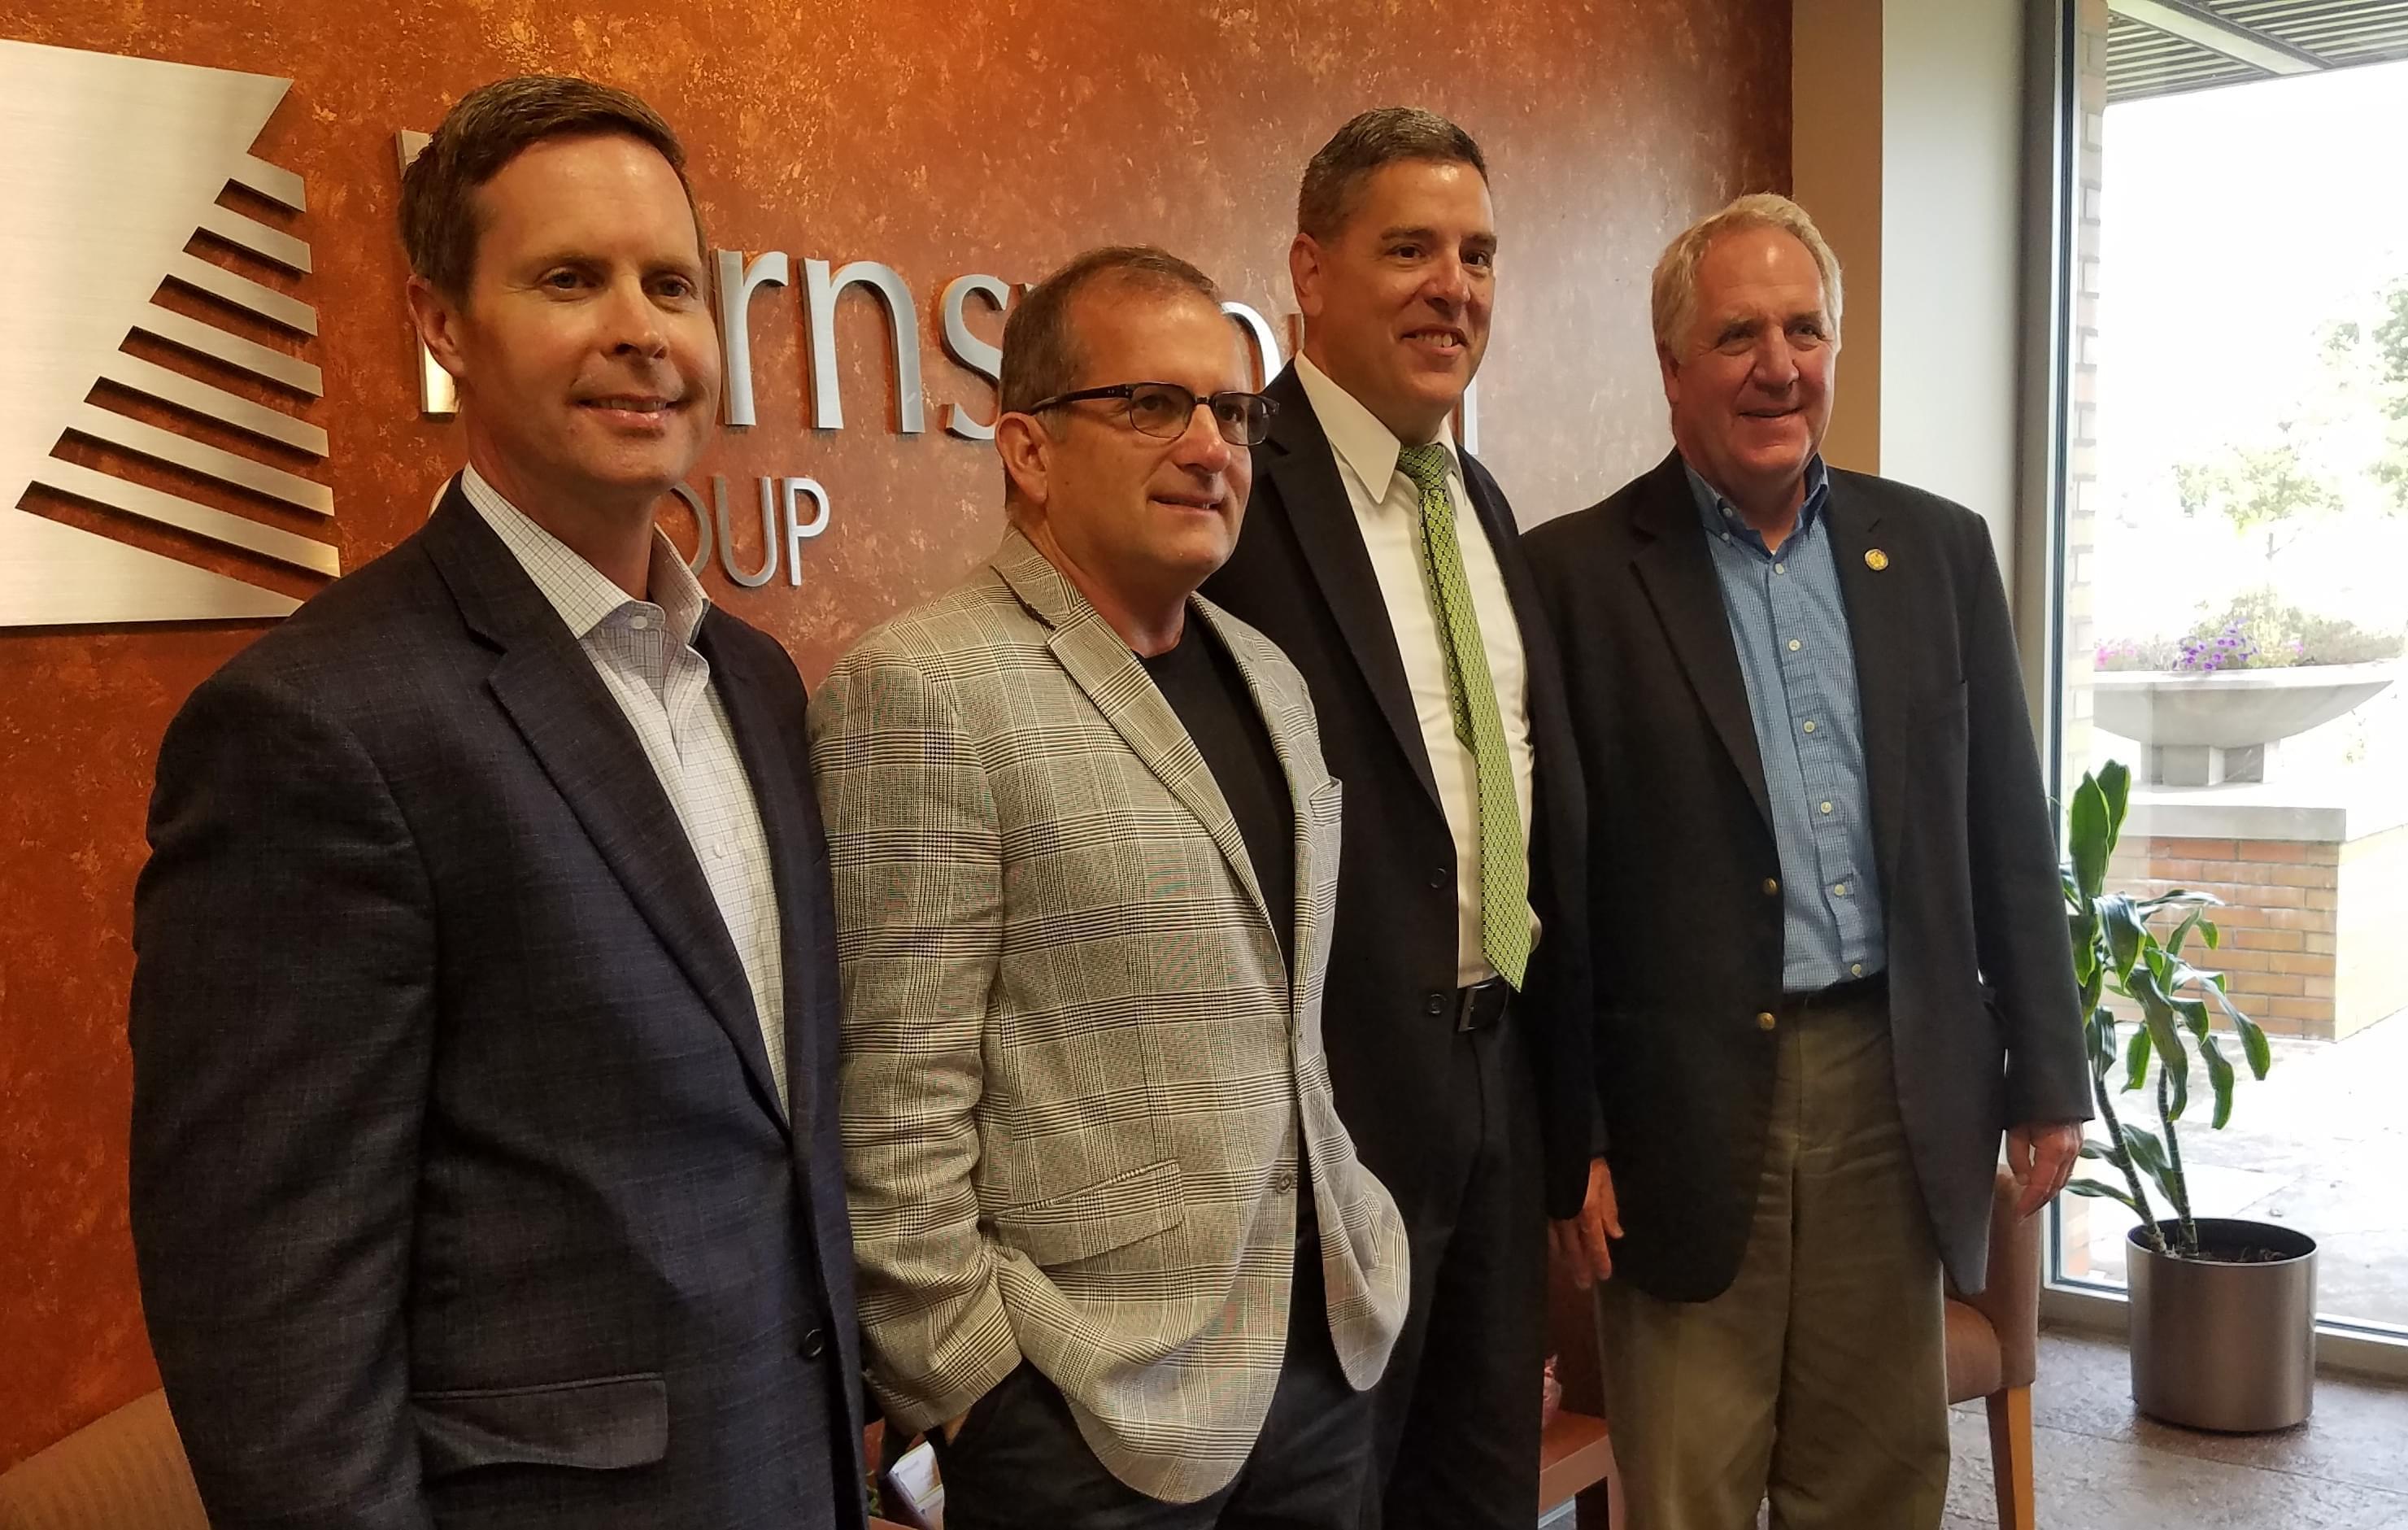 Congressmen Rodney Davis and John Shimkus pose with Farnsworth Group executives Greg Cook & Matt Davidson.